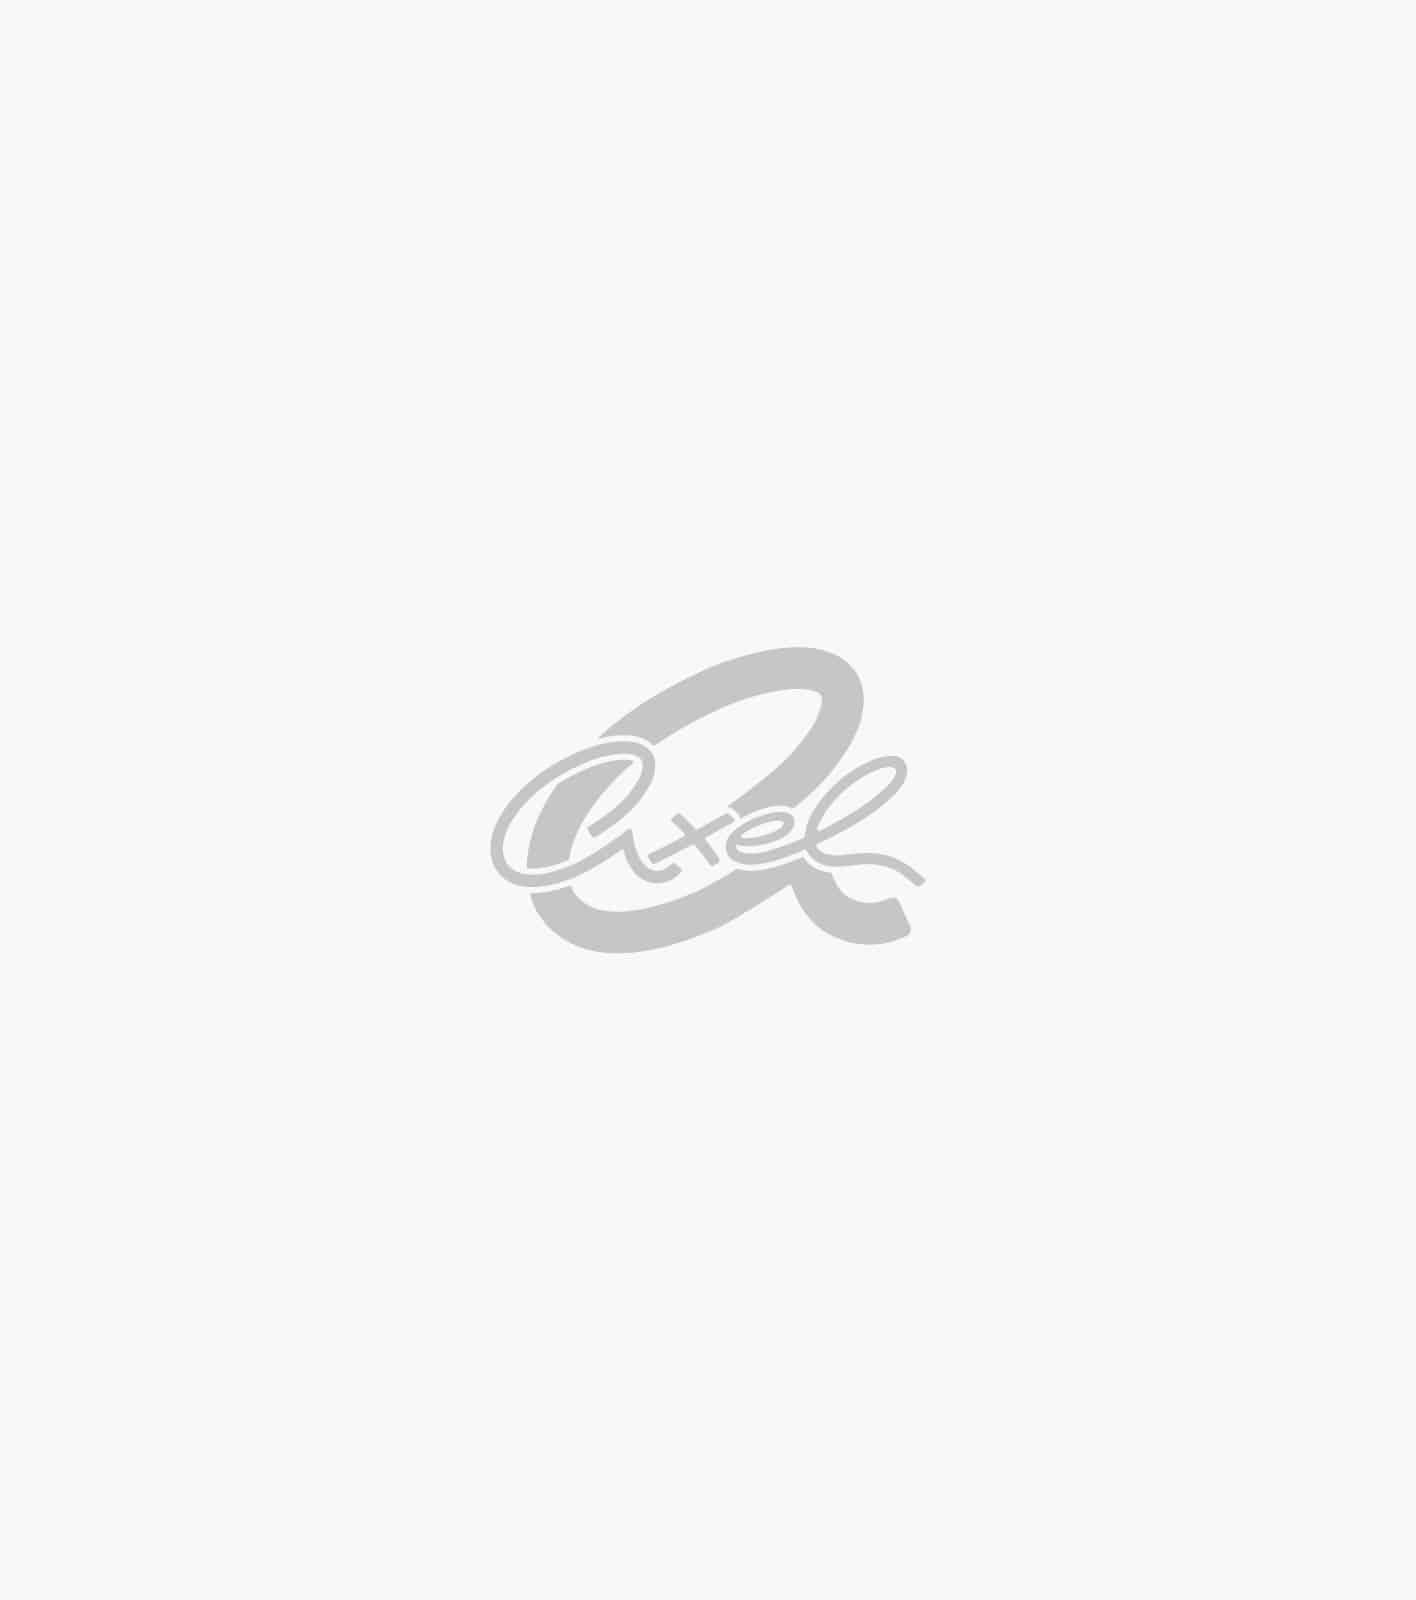 AXEL CONCEPT ΤΣΑΝΤΕΣ - ΣΥΛΛΟΓΗ - ΤΣΑΝΤΕΣ 66b039d4d00